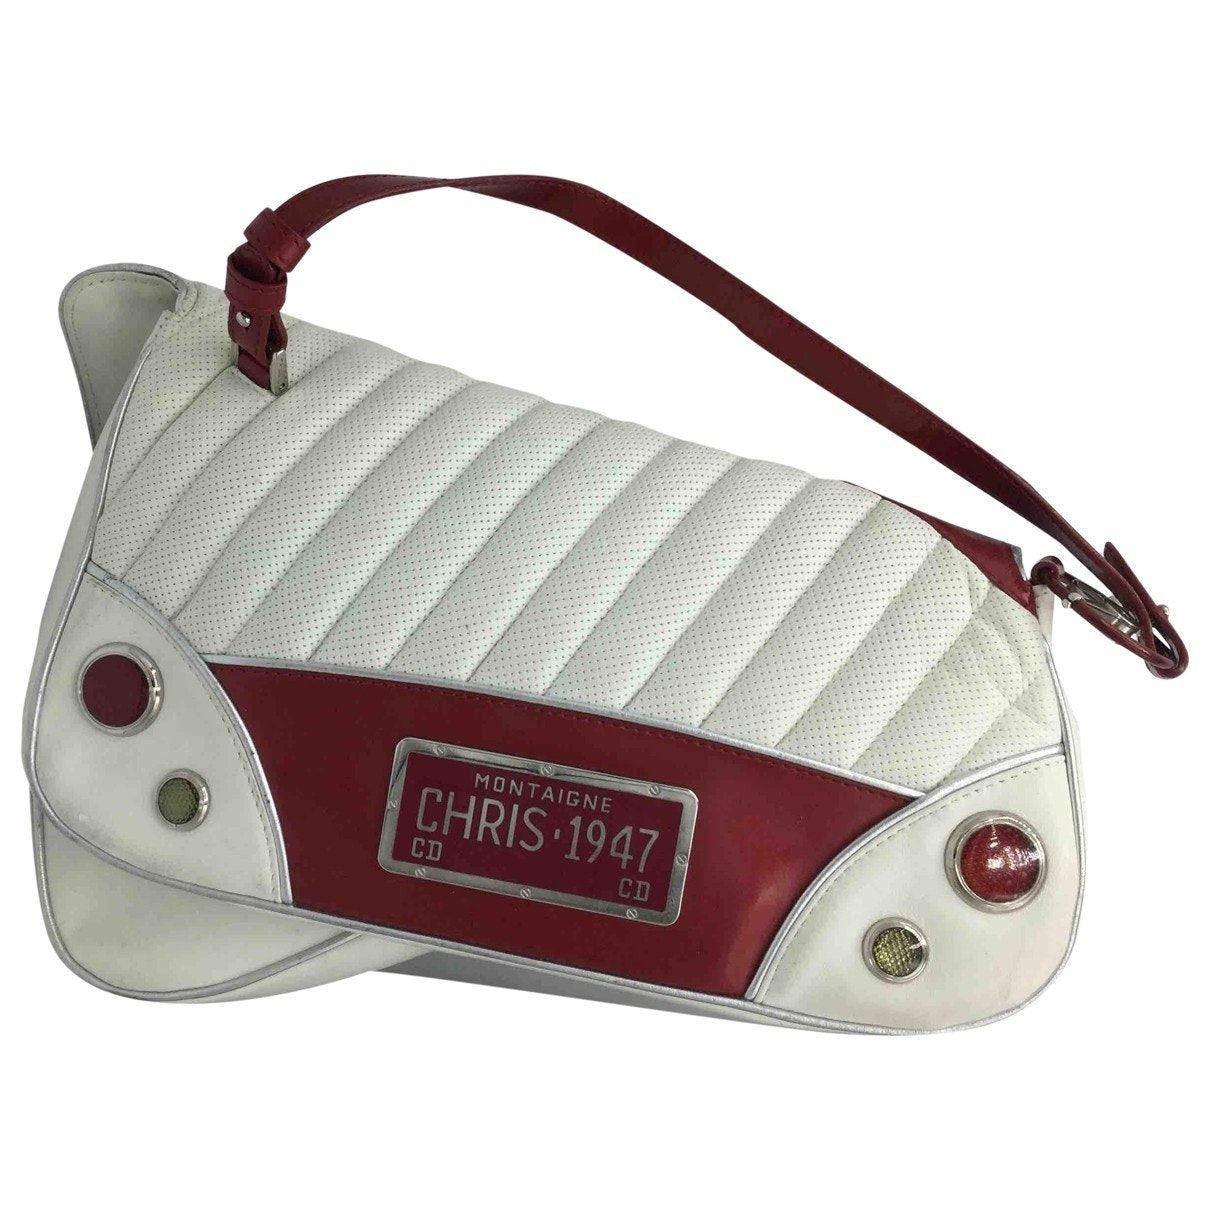 Cadillac Lederhandtasche Dior Weiß in Leder – 9241570   – Products